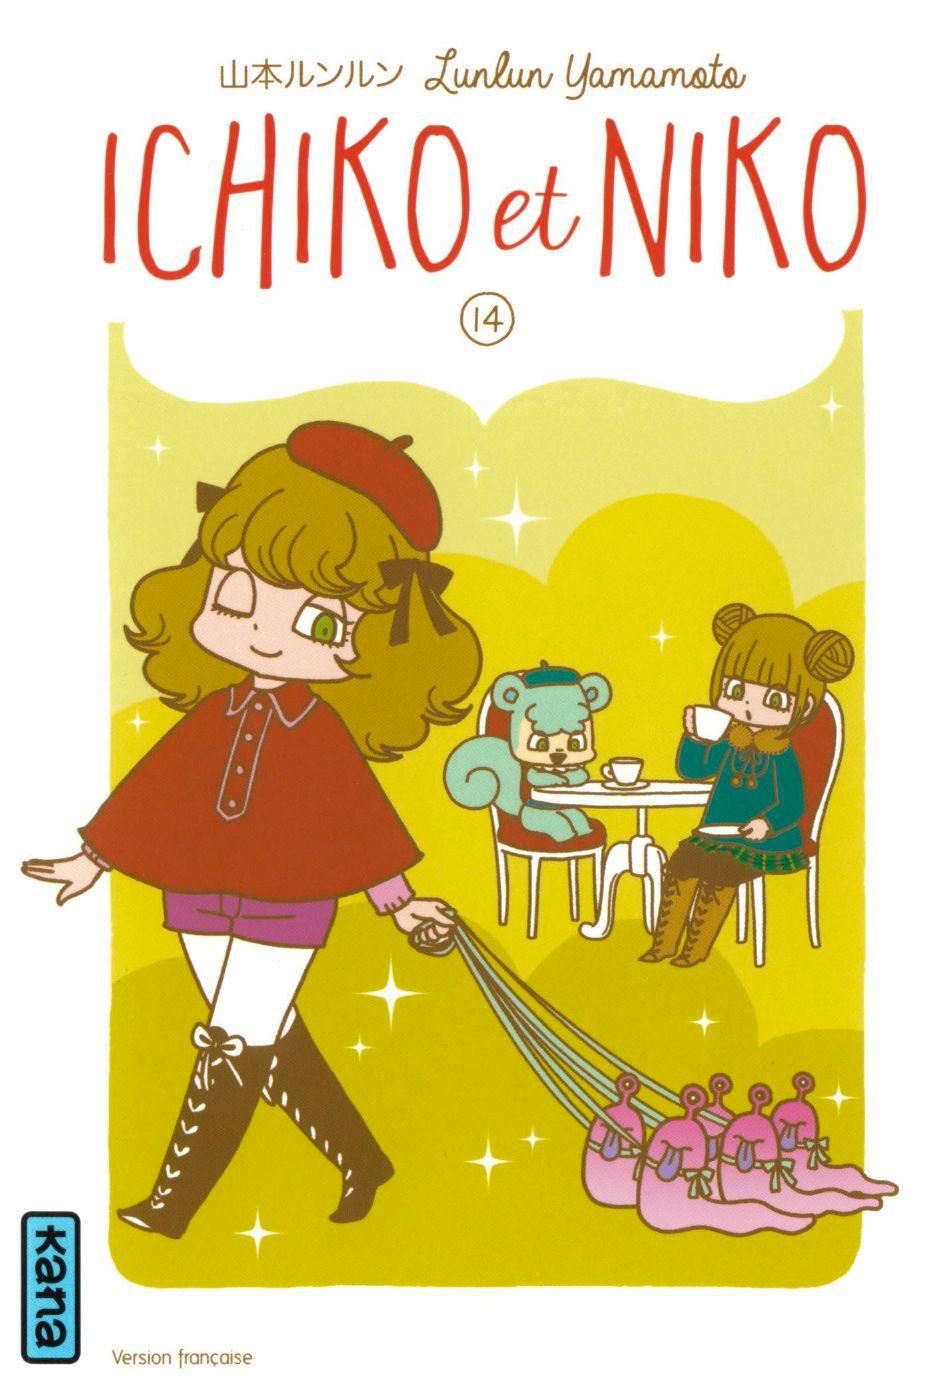 Sortie Manga au Québec JUILLET 2021 Ichiko-neko-14-kana